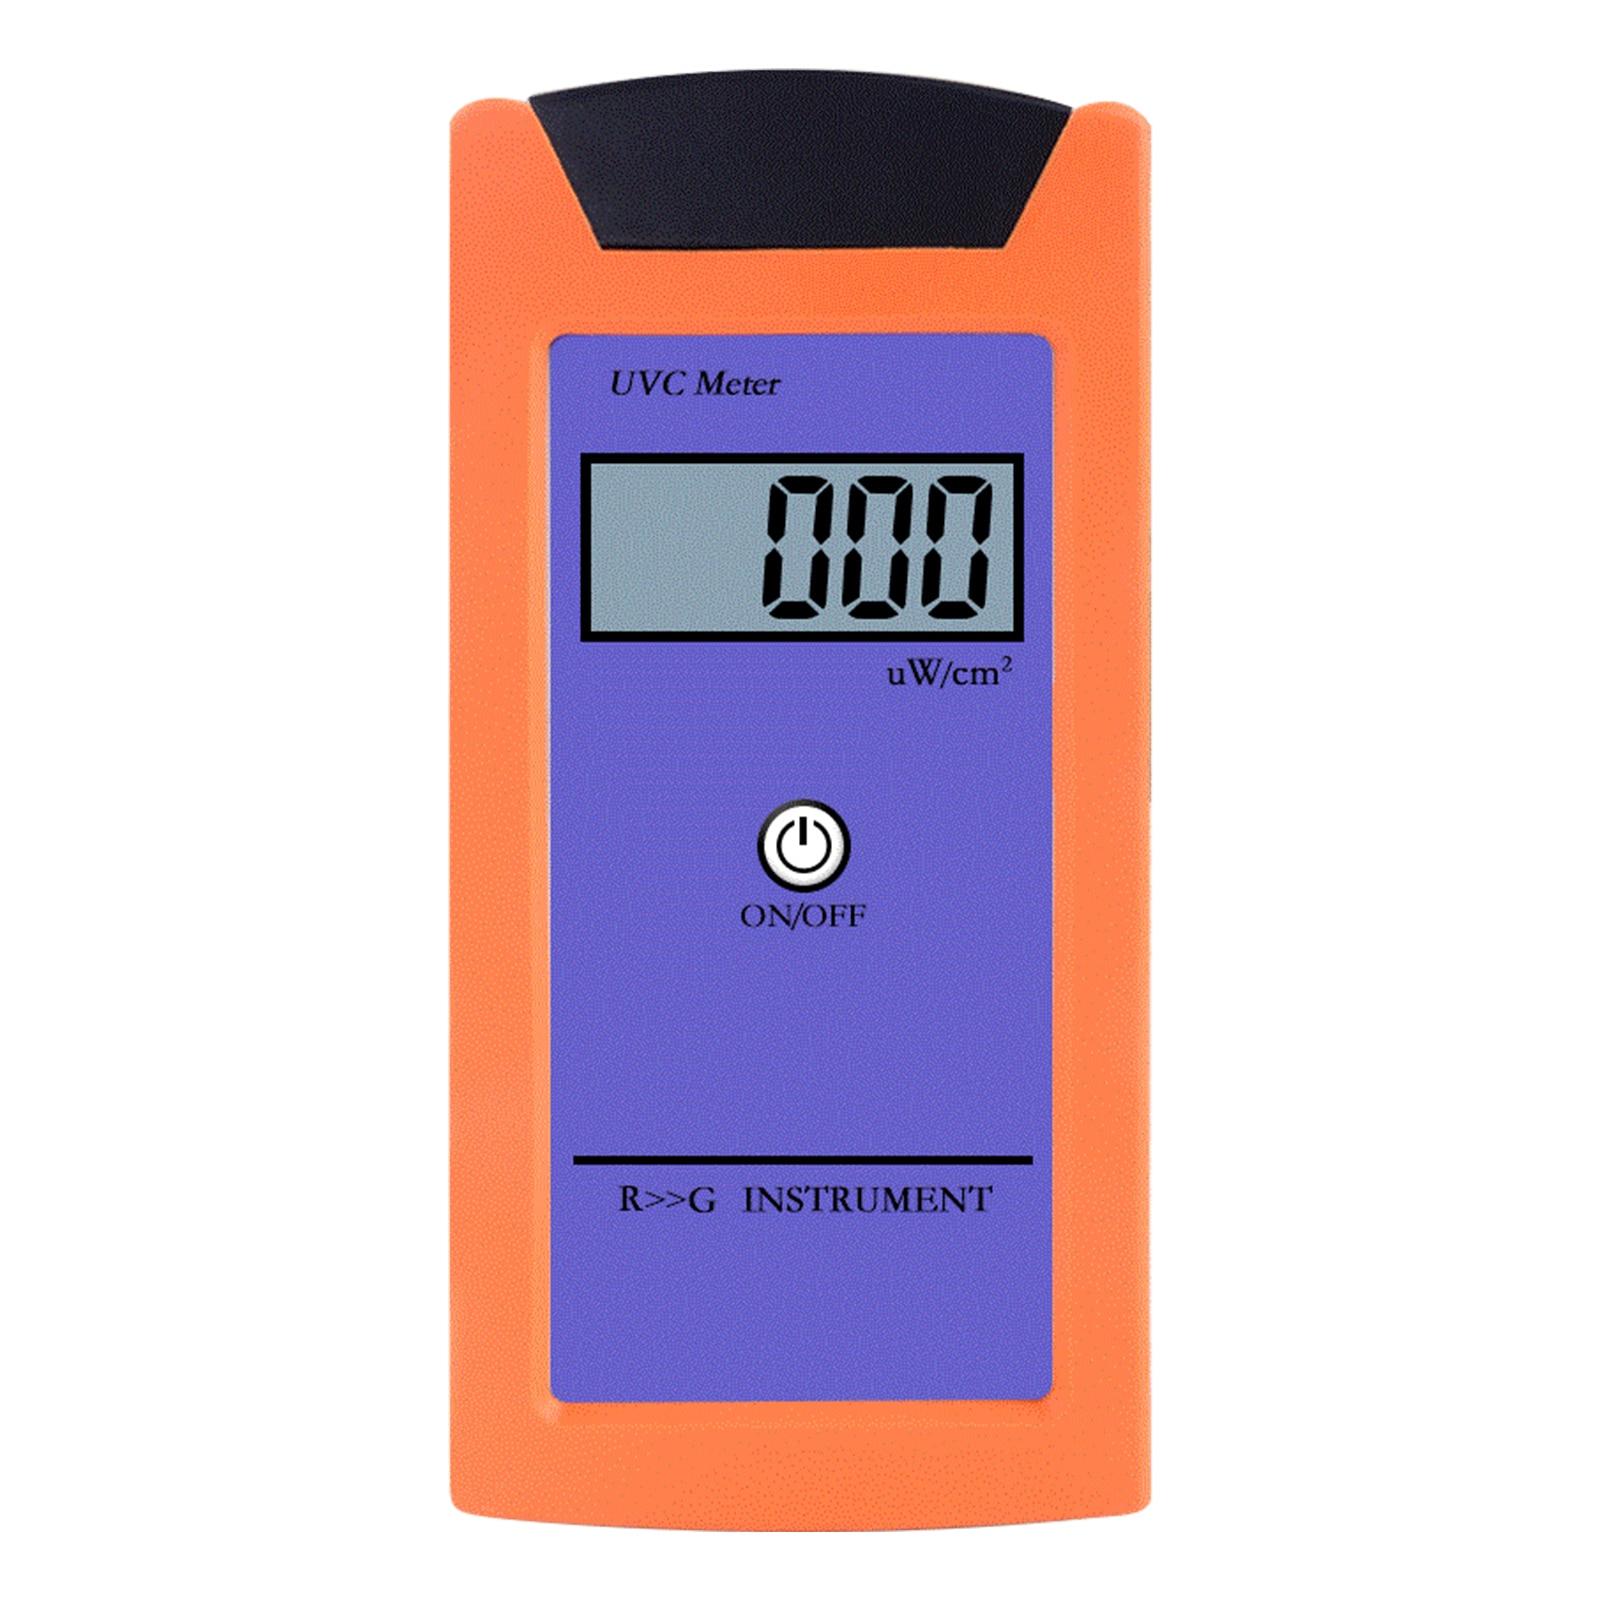 RGM-UVC مقياس إضاءة رقمي لأشعة الزواحف فوق البنفسجية عالية الدقة الأشعة فوق البنفسجية الأشعة فوق البنفسجية متر مع قياس الأشعة فوق البنفسجية الا...